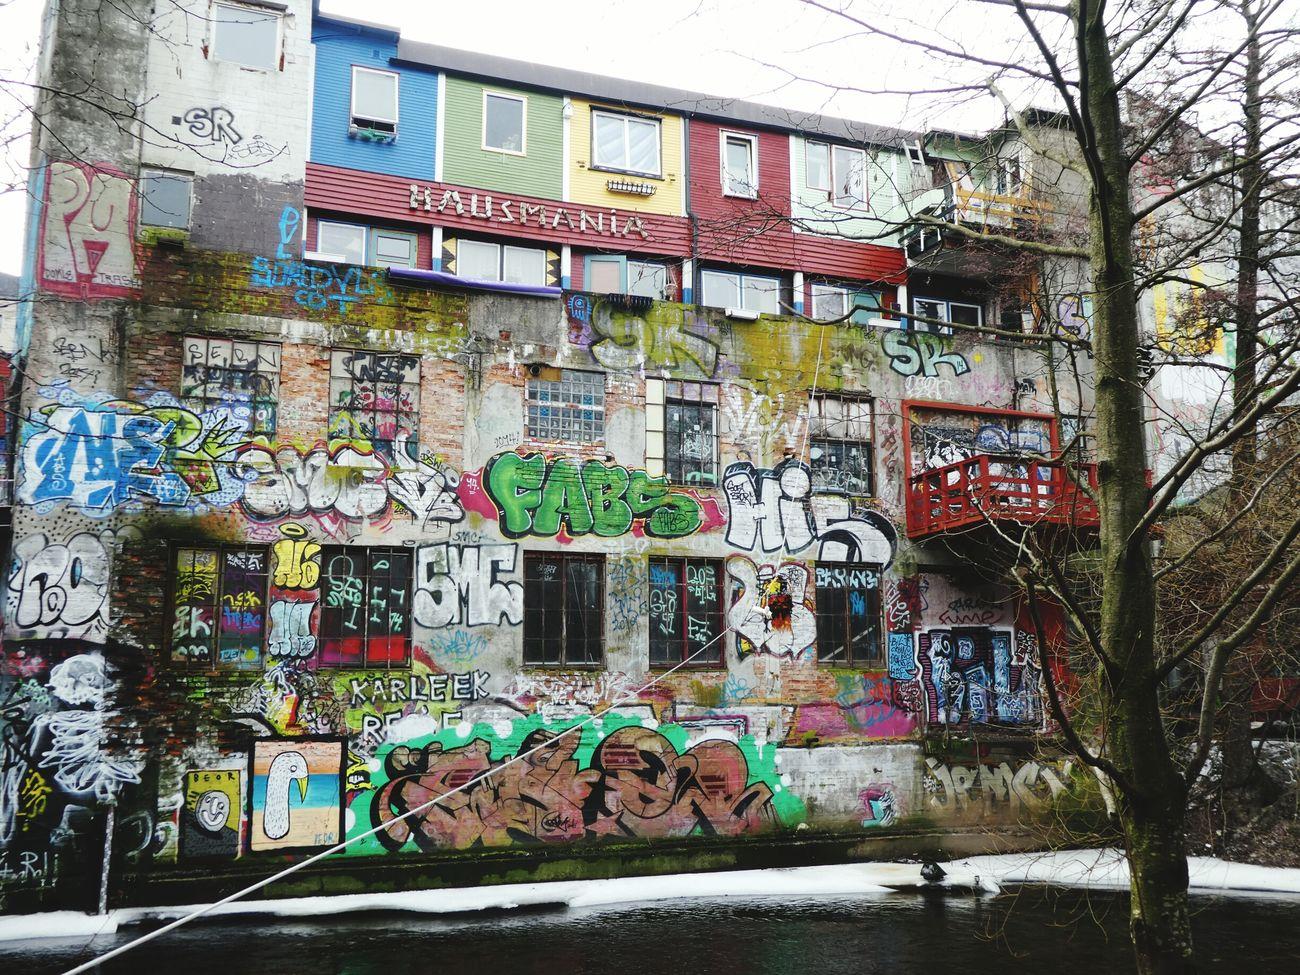 Graffiti Street Art Building Exterior Urban Lifestyle City Life Walking Around Taking Pictures Akerselva Hausmania